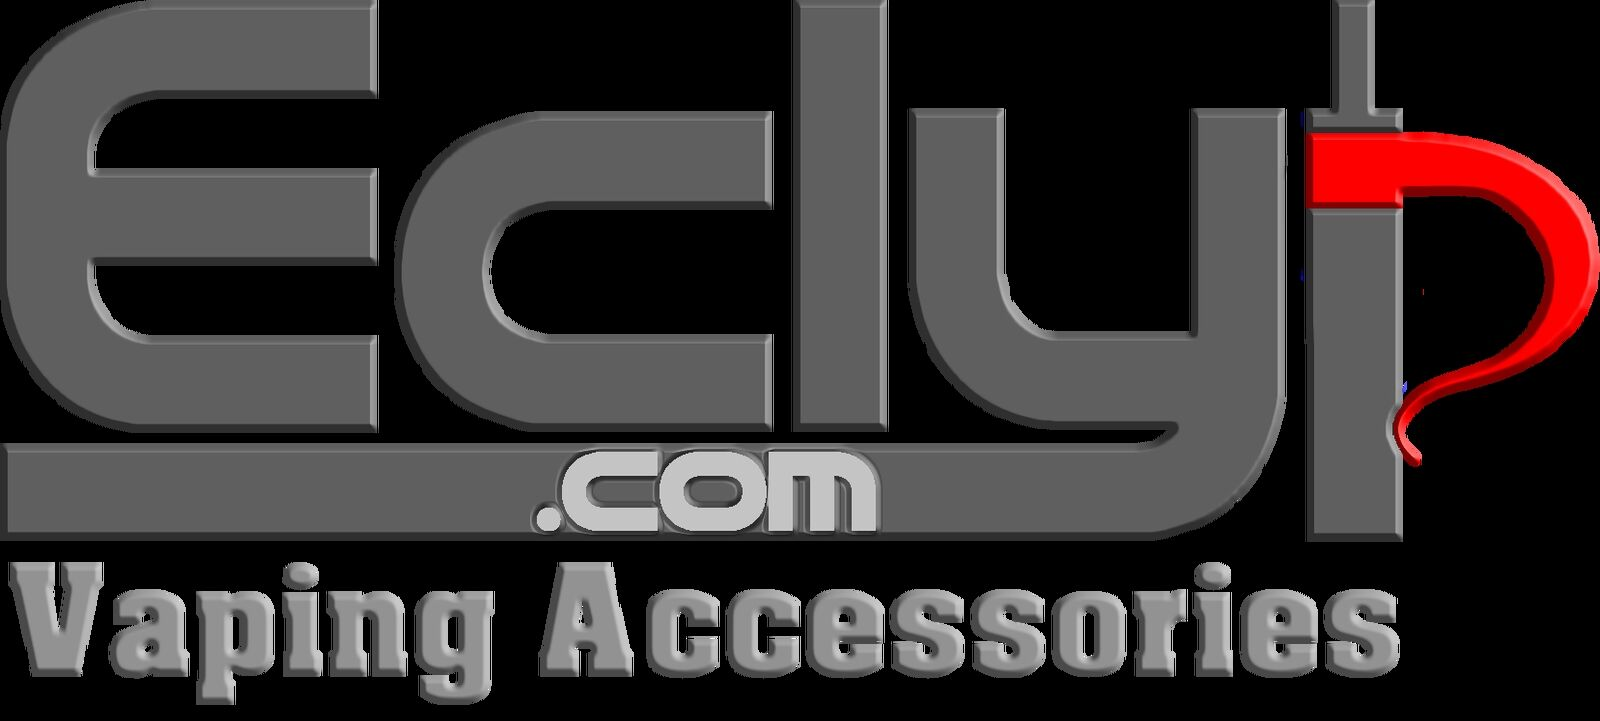 Eclyp vaping accessories